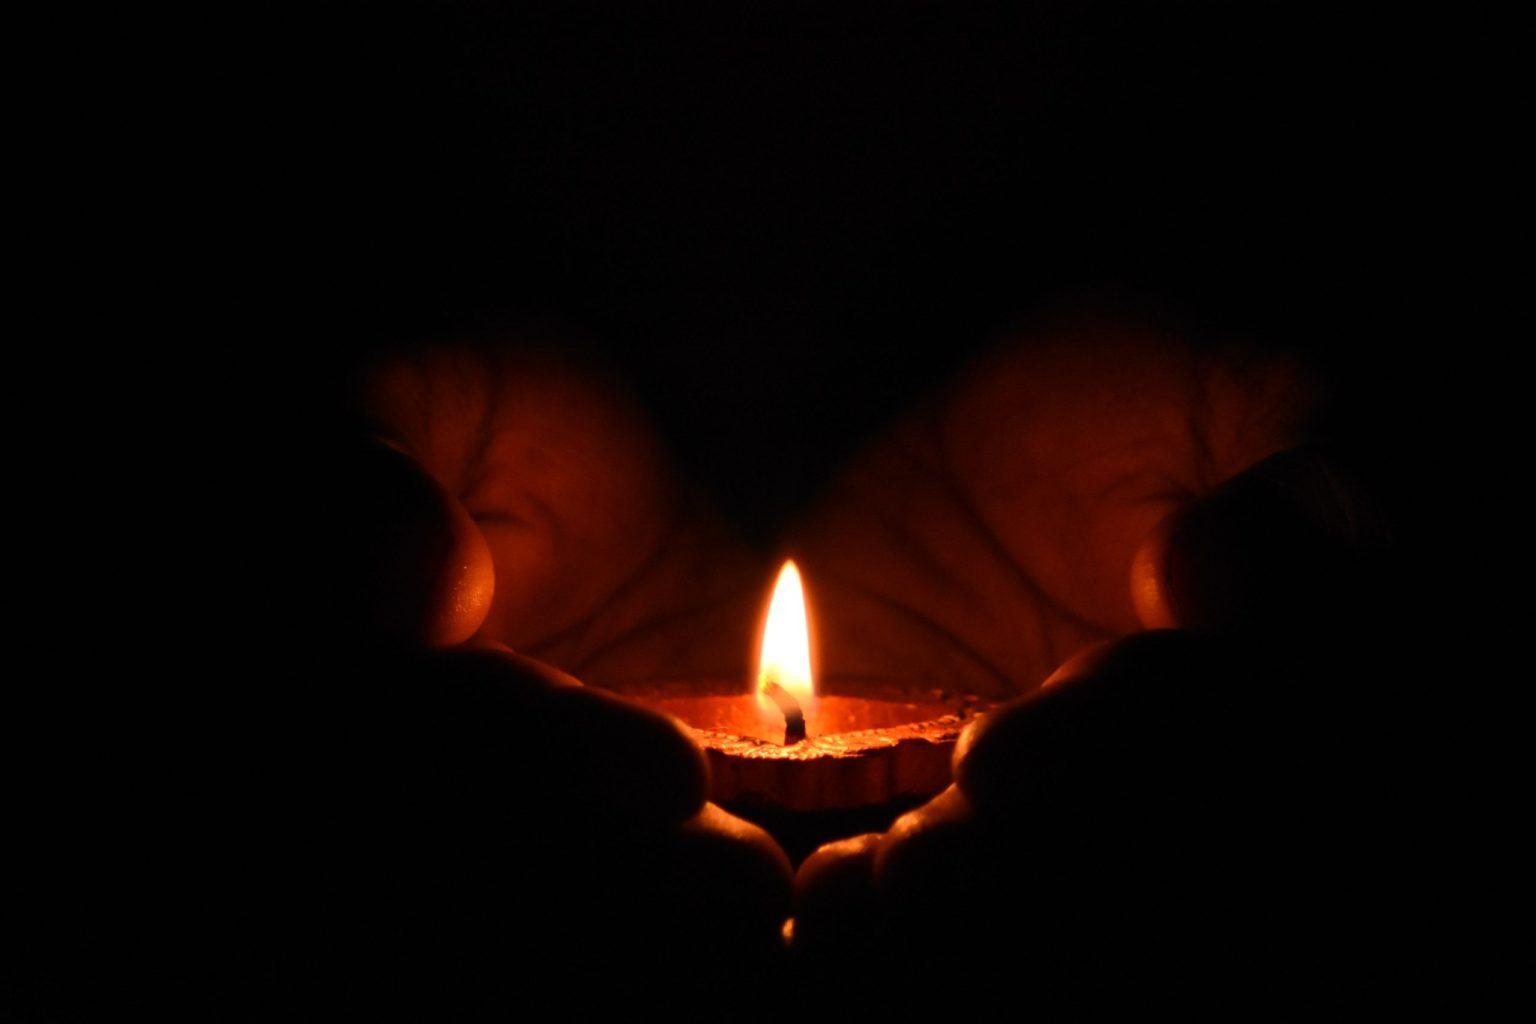 В Казахстане объявят минуту молчания в память о жертвах COVID-19